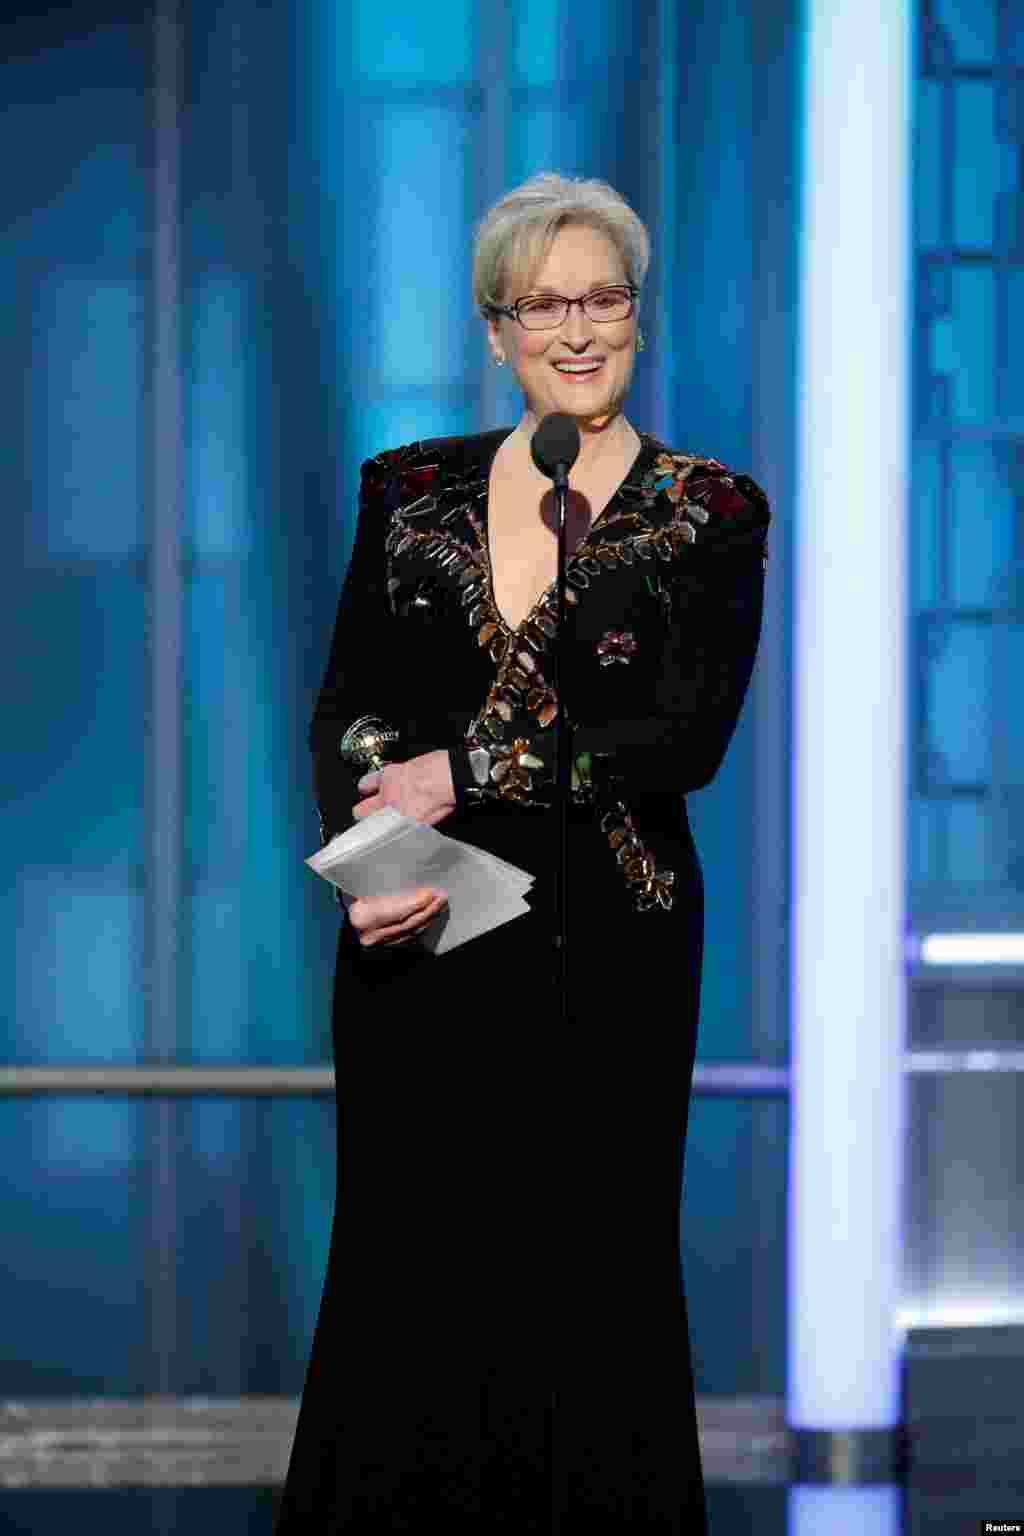 Aktris veteran Meryl Streep menerima penghargaan Cecil B. DeMille di acara Golden Globe Awards ke-74 di Beverly Hilton Hotel (8/1) di Beverly Hills, California.